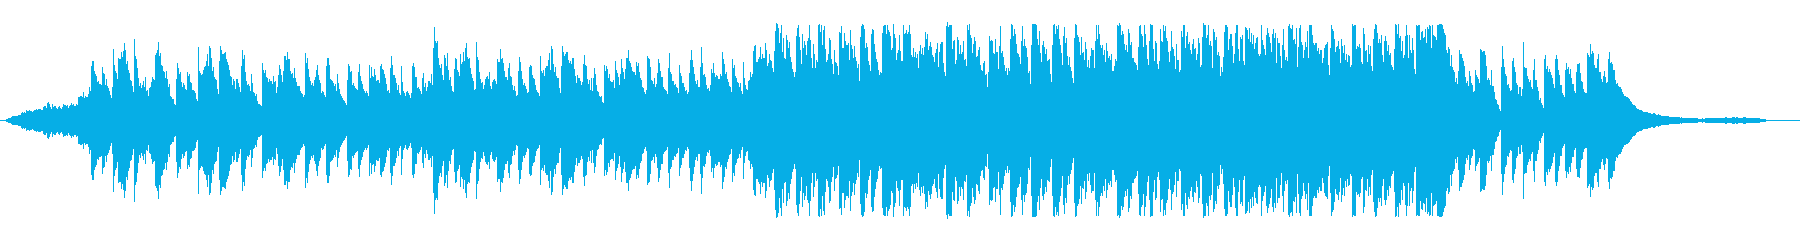 White Snow X'masの再生済みの波形